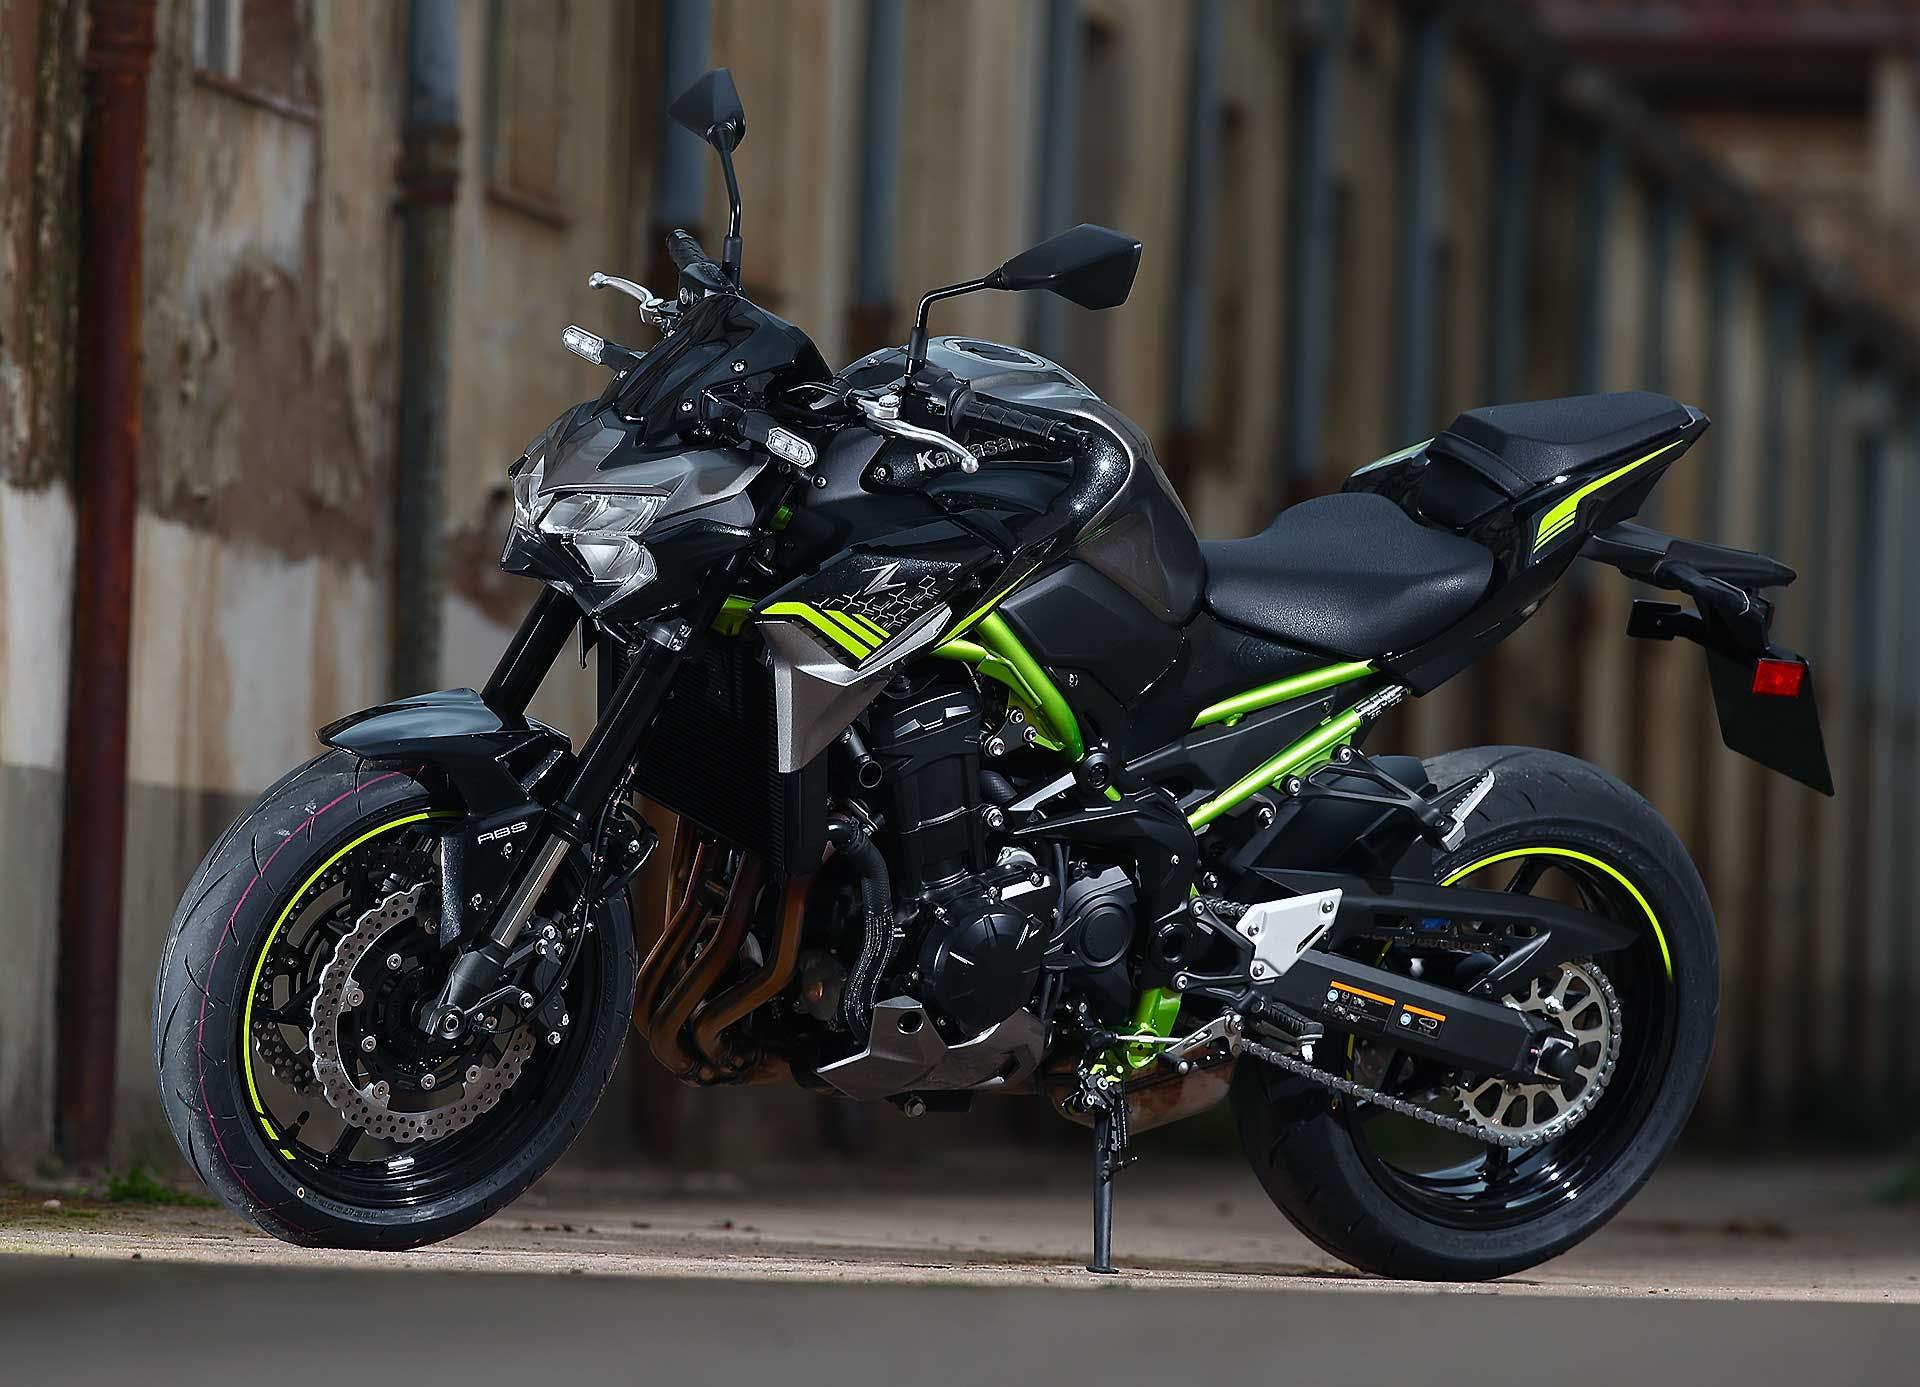 Kawasaki Z900 Nera telaio verde